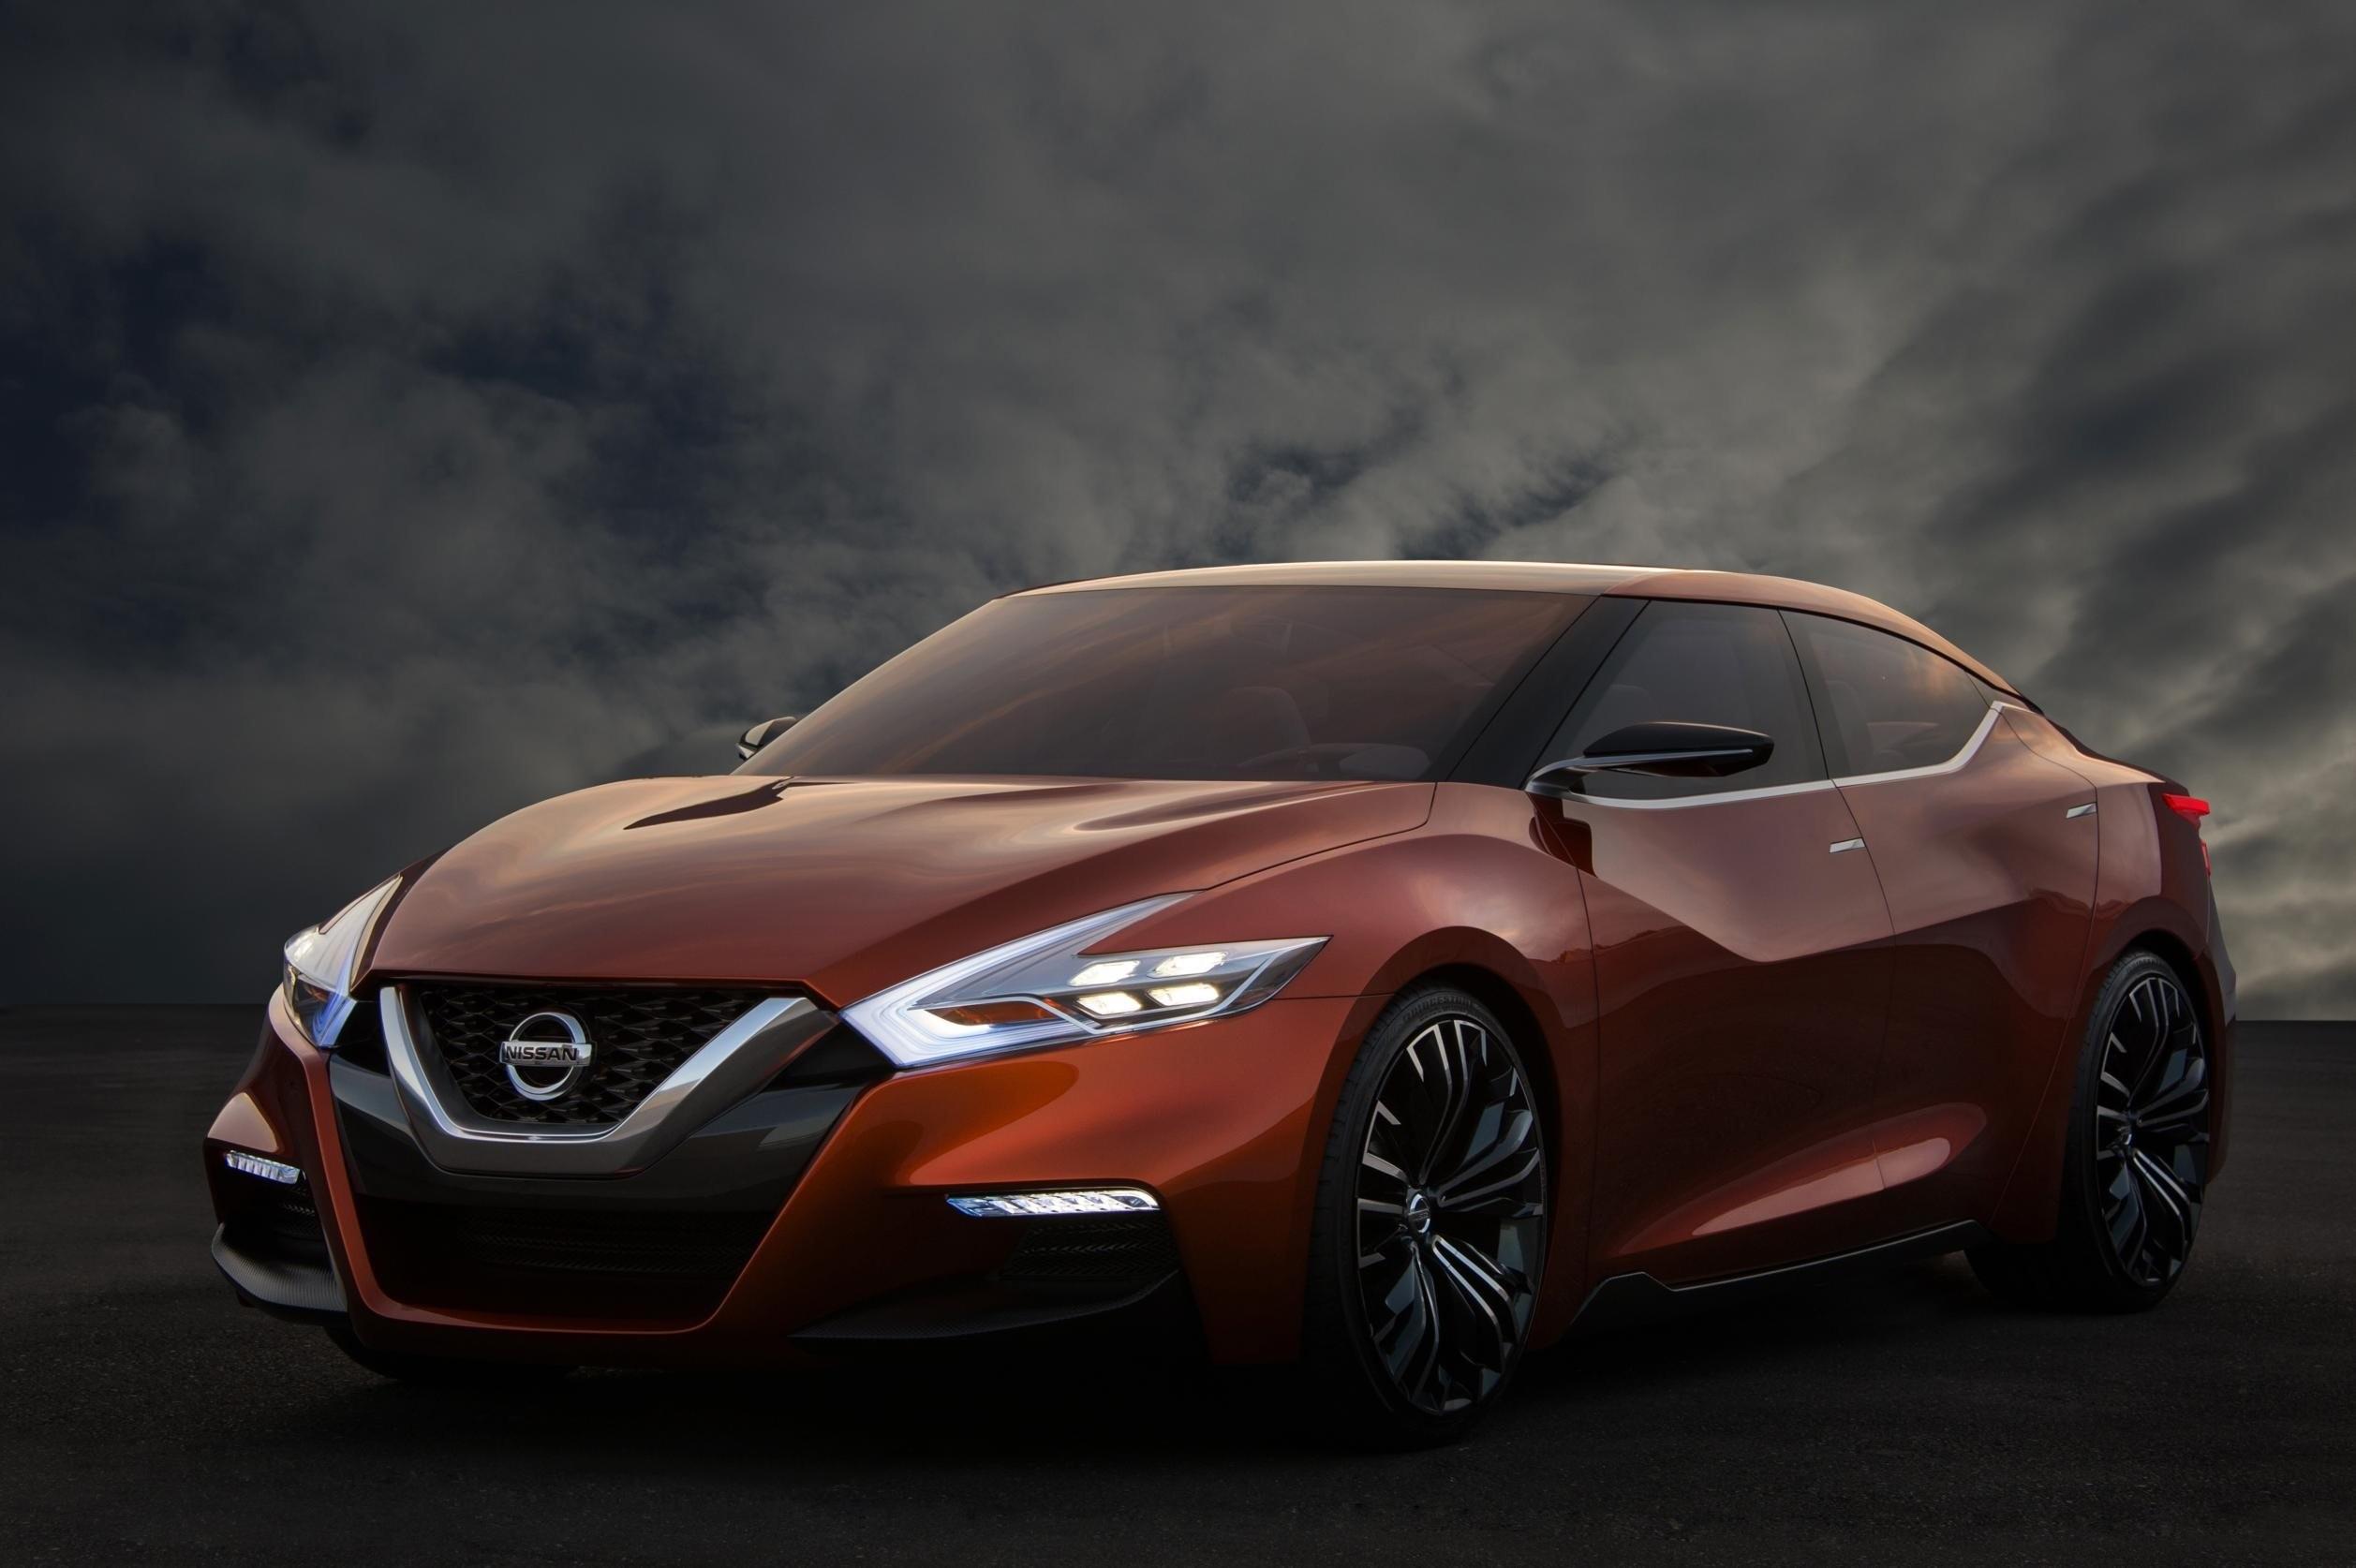 Sfondi : Nissan, auto sportiva, Mazda, Berlina, automobili ...